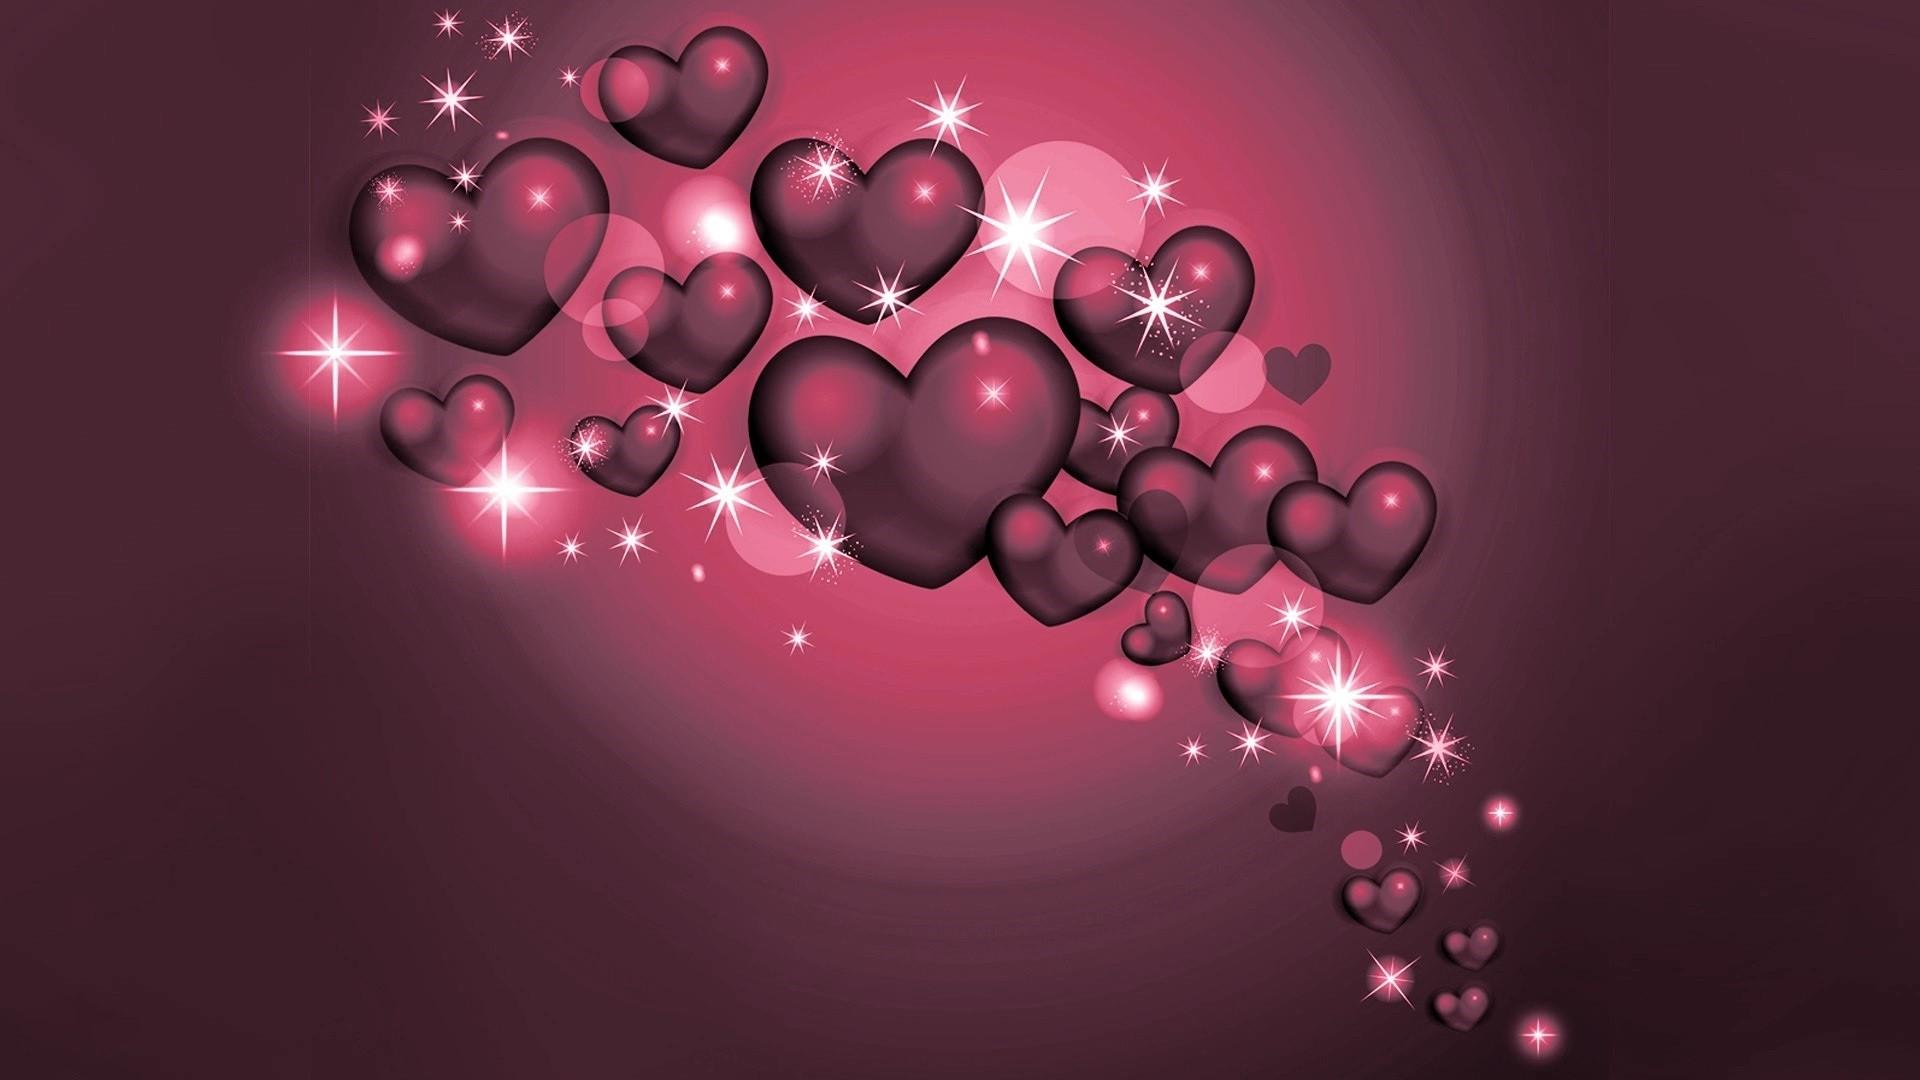 3d Heart Wallpaper Screensavers 54 Images